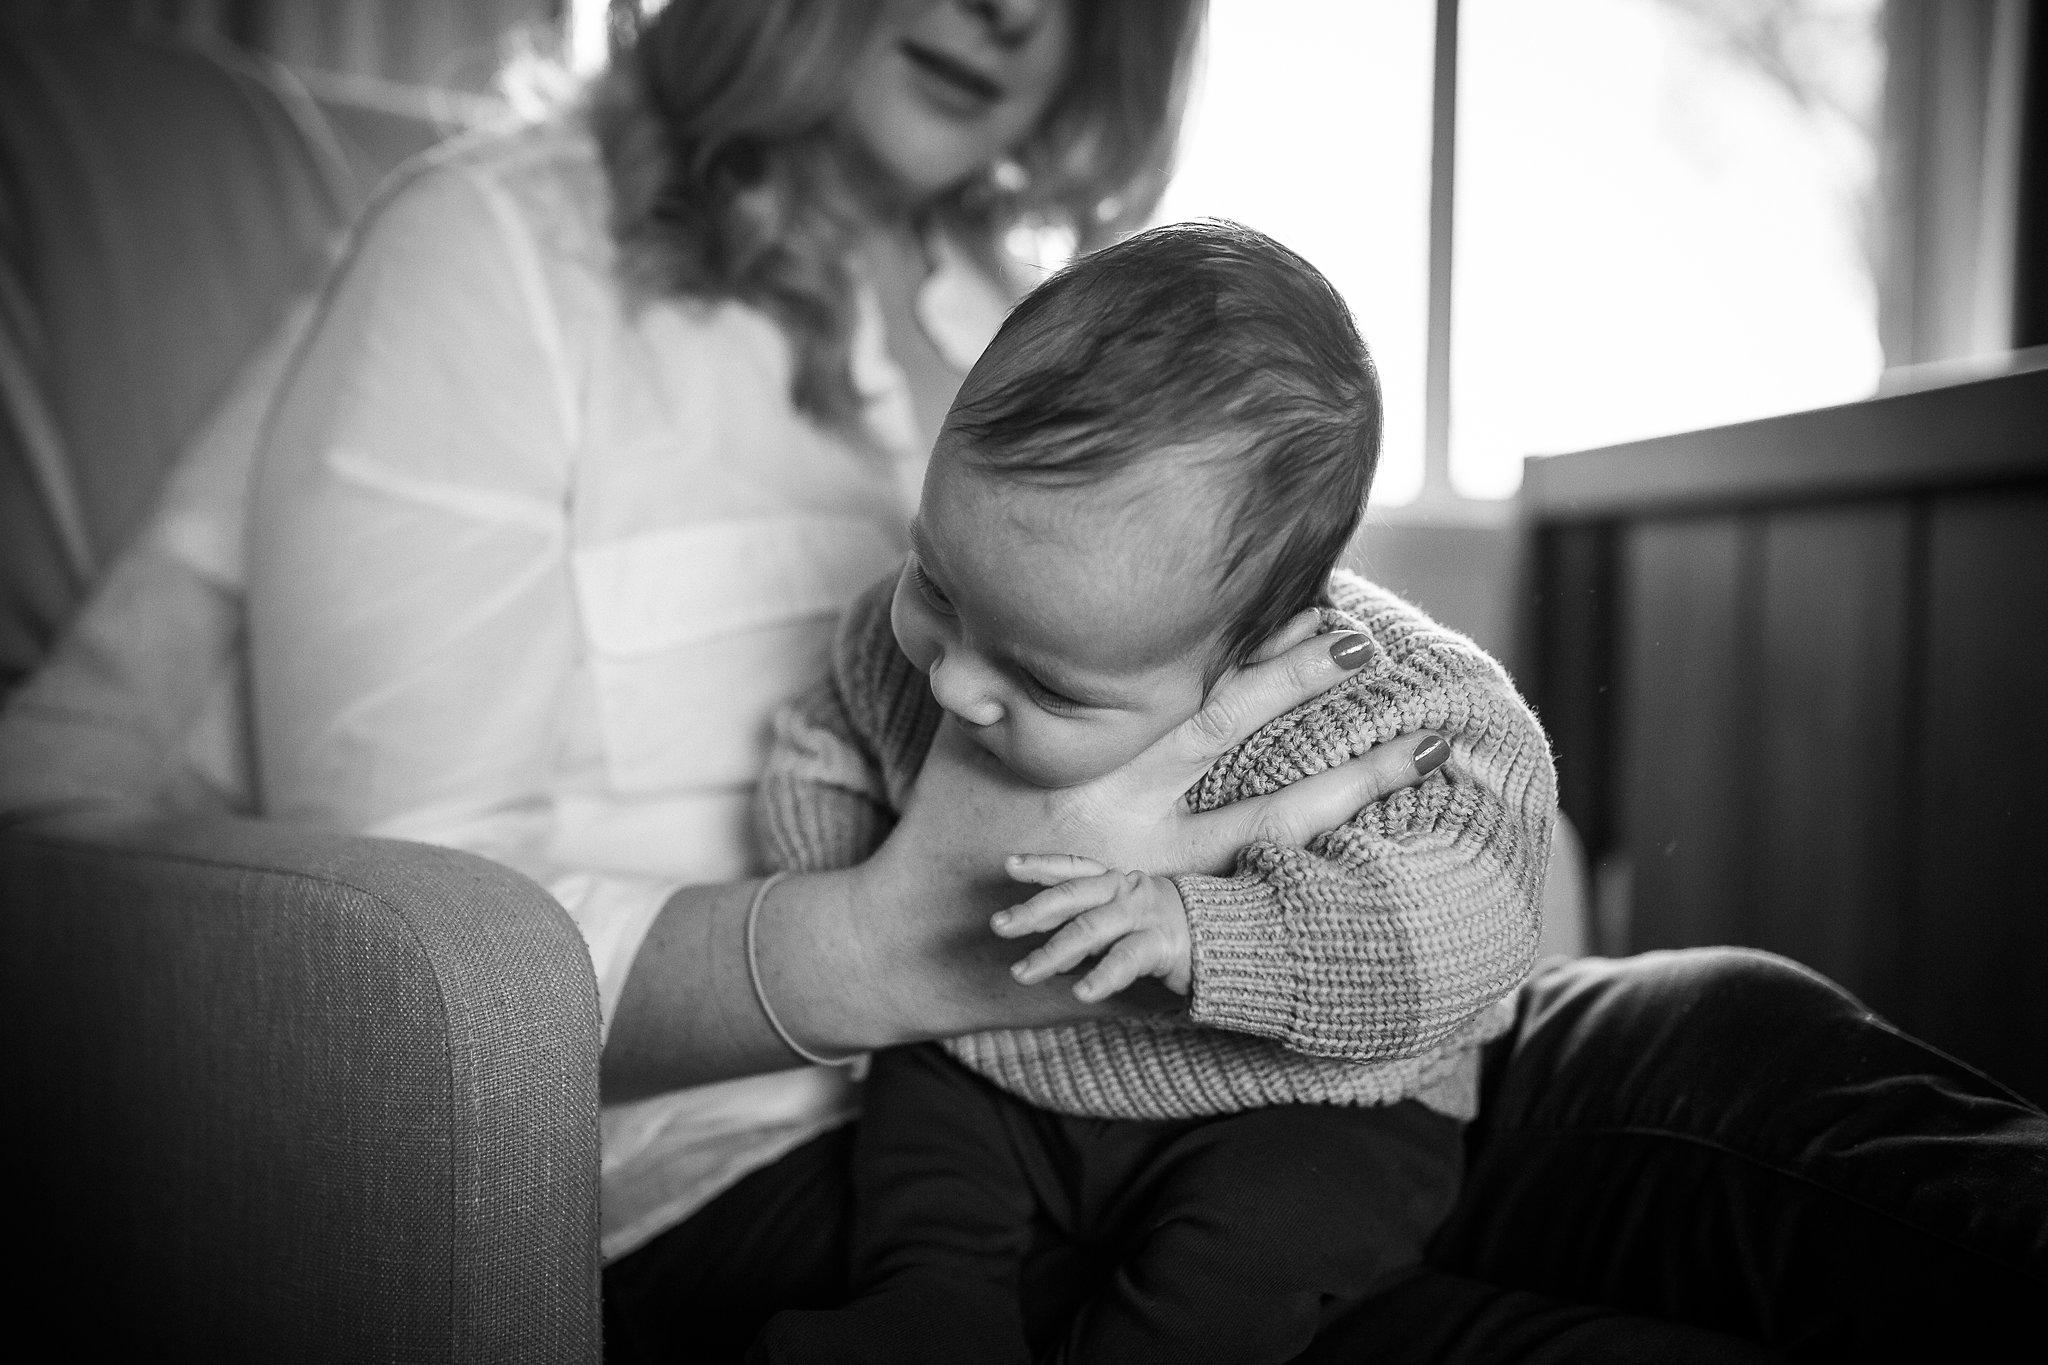 newborn-baby-in-home-family-photography-albury-wodonga-north-east-victoria (6).jpg